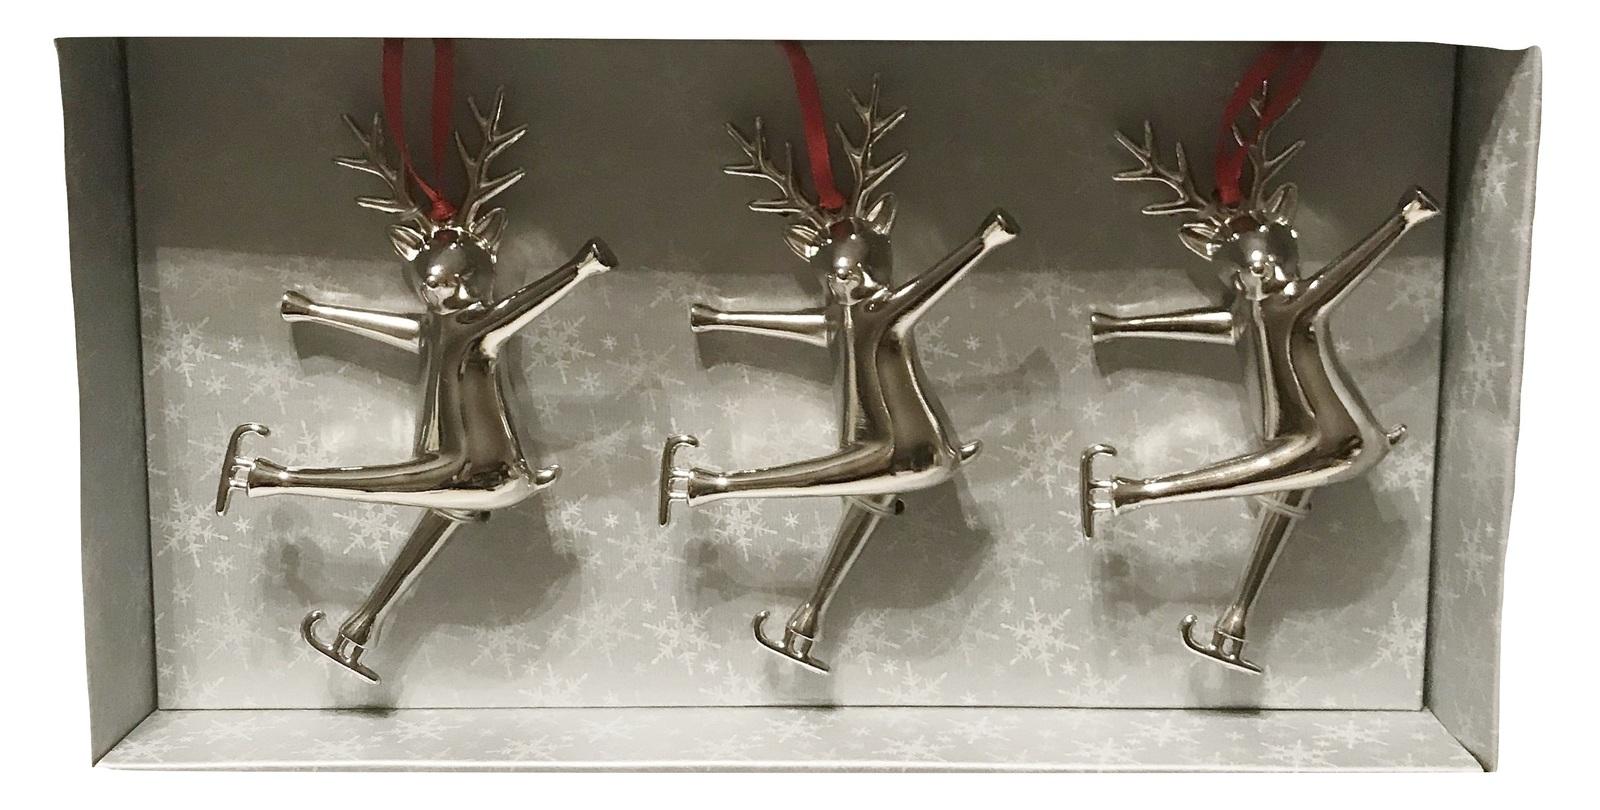 Aluminum Reindeer on Skates Trio Holiday Christmas Ornaments Set, 3 pcs